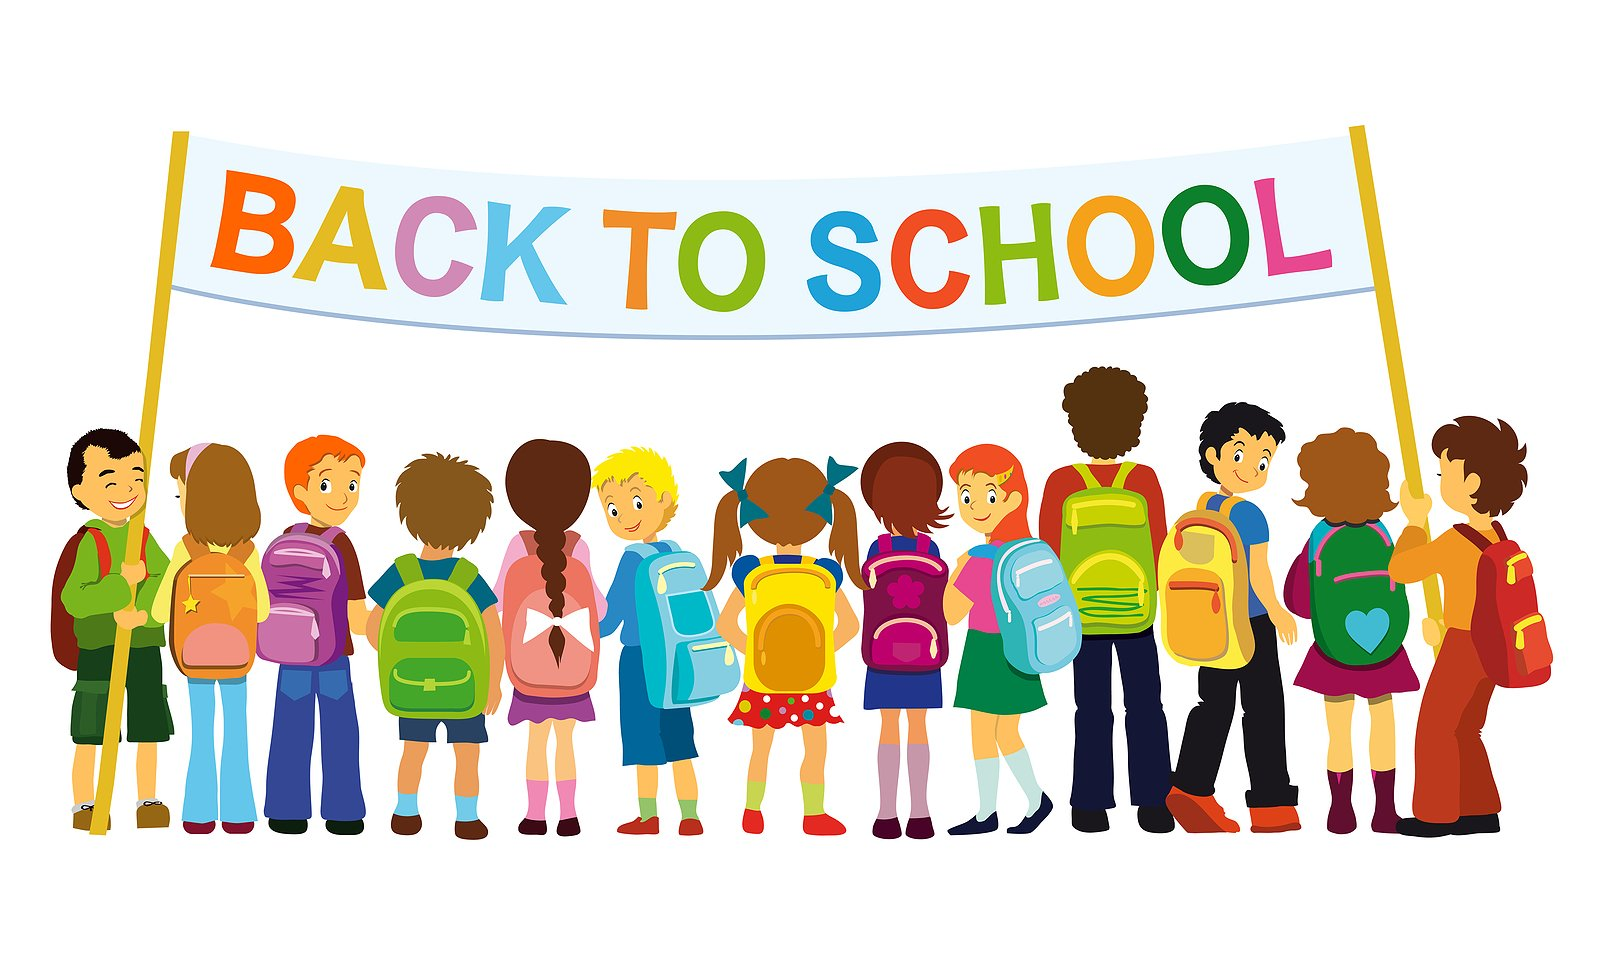 Back to school clipart 2-Back to school clipart 2-8